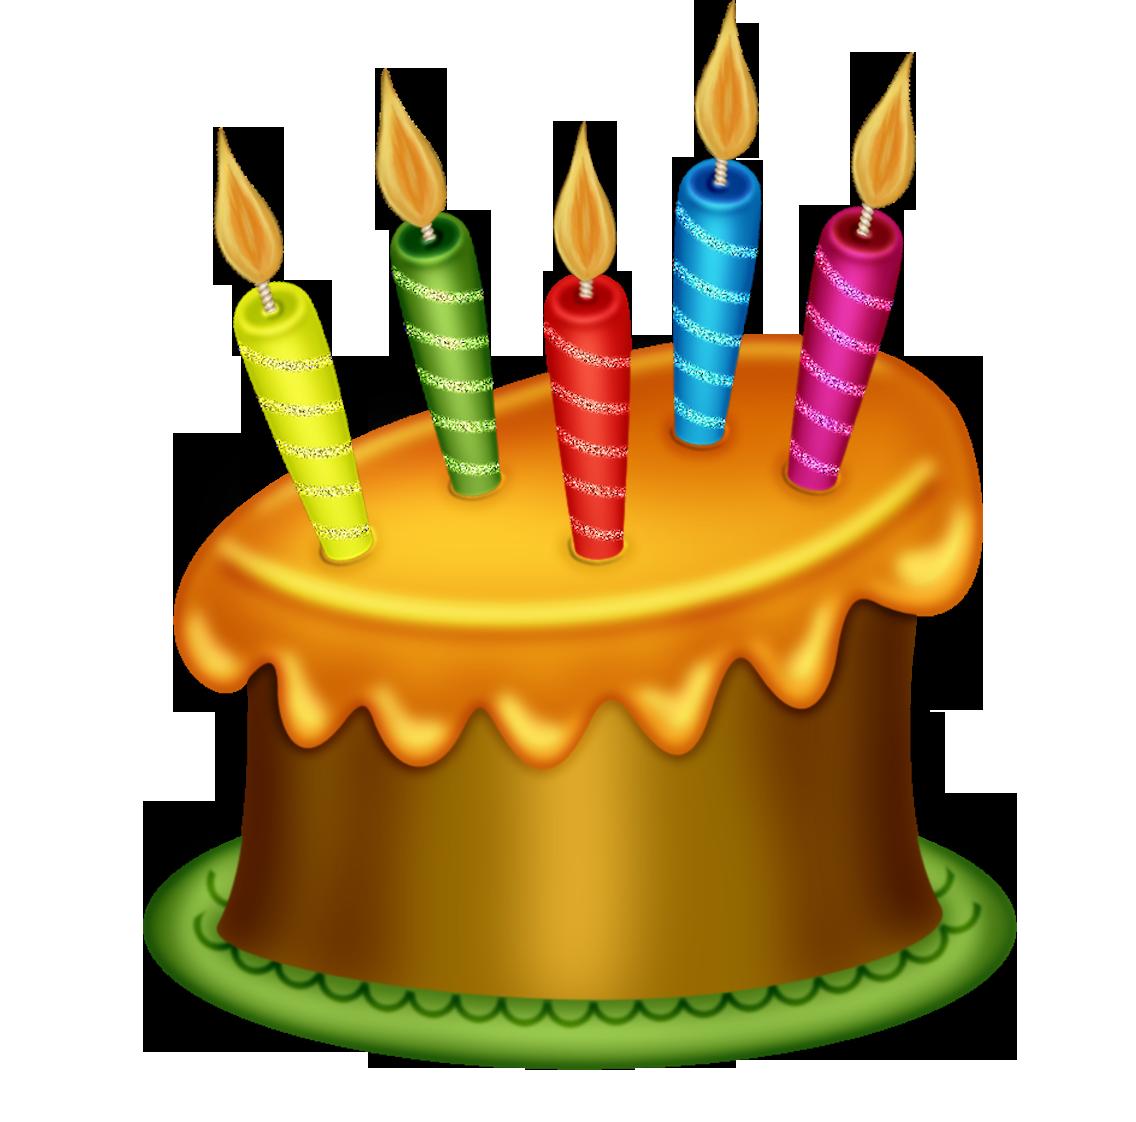 Orange birthday cake clipart jpg transparent library Orange birthday cake clipart - ClipartFest jpg transparent library